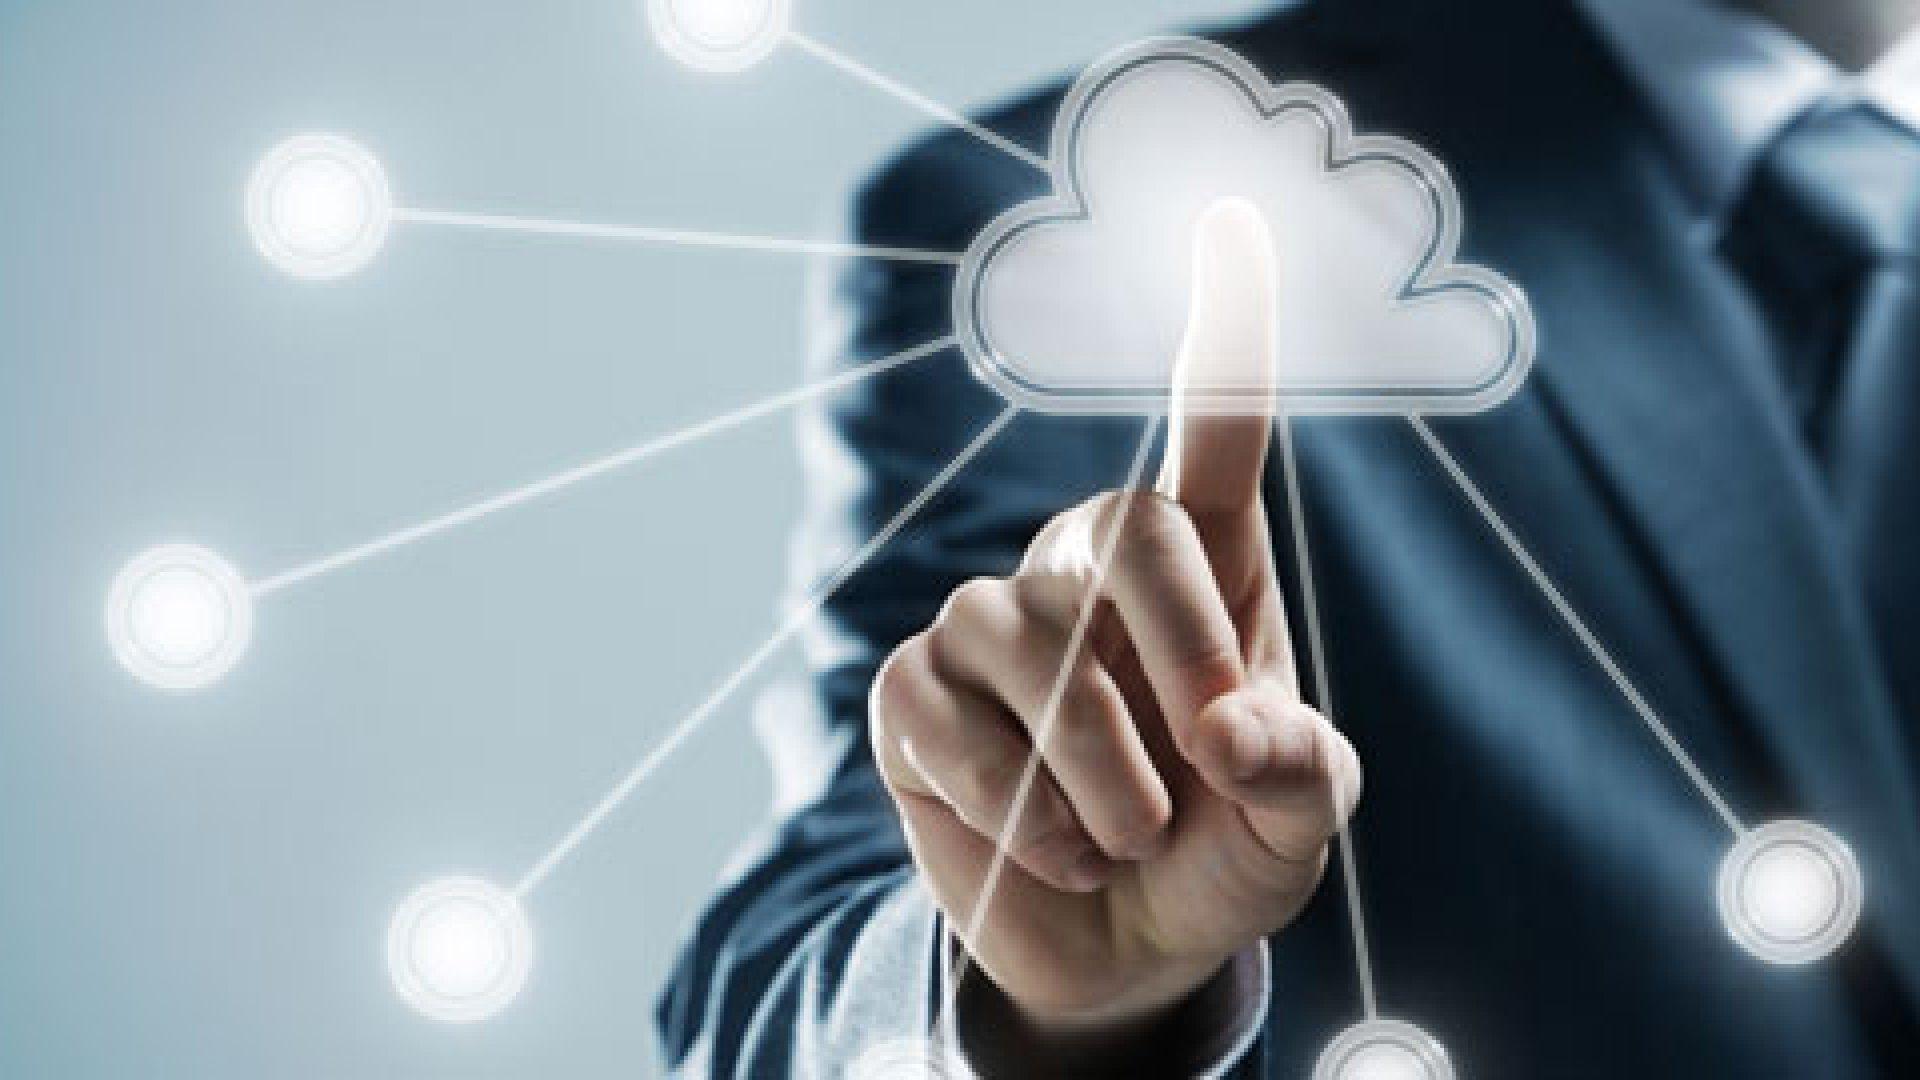 How to Comparison Shop the Cloud: 5 Tips